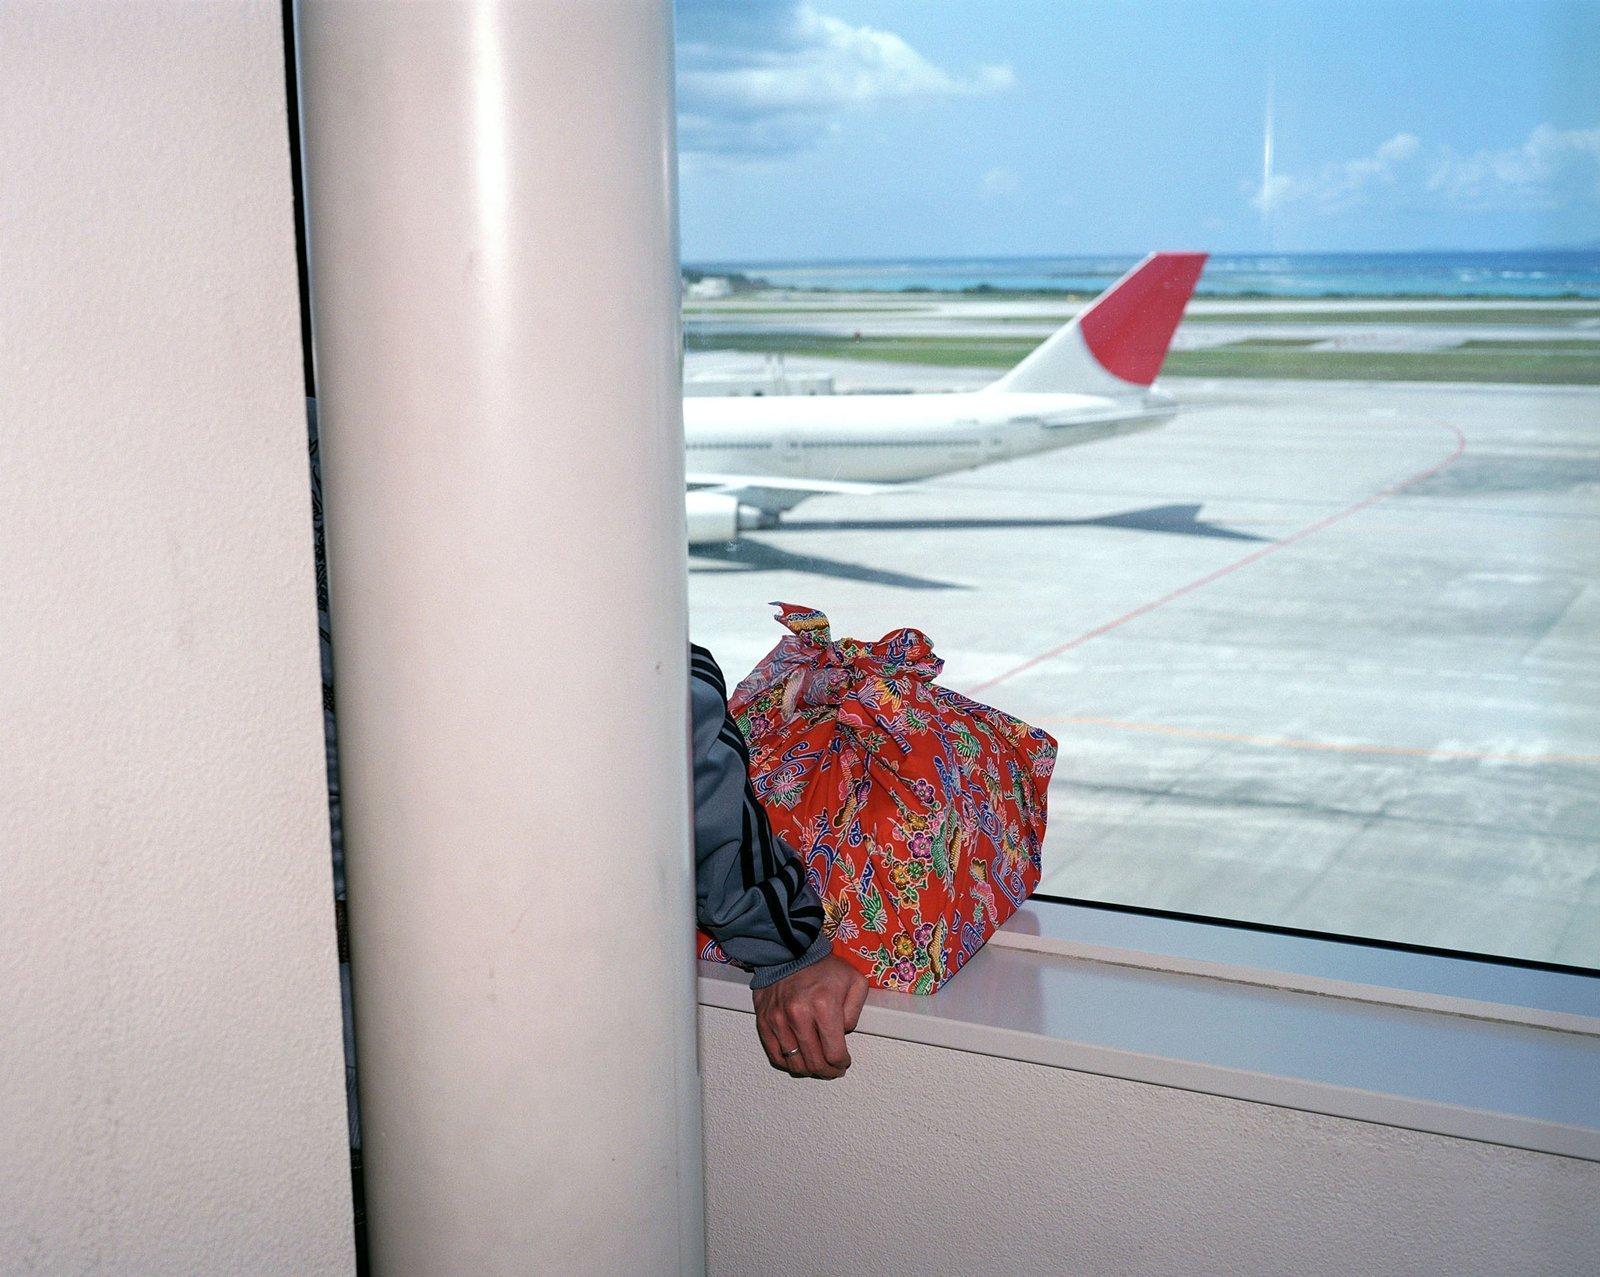 Naha Airport, Okinawa